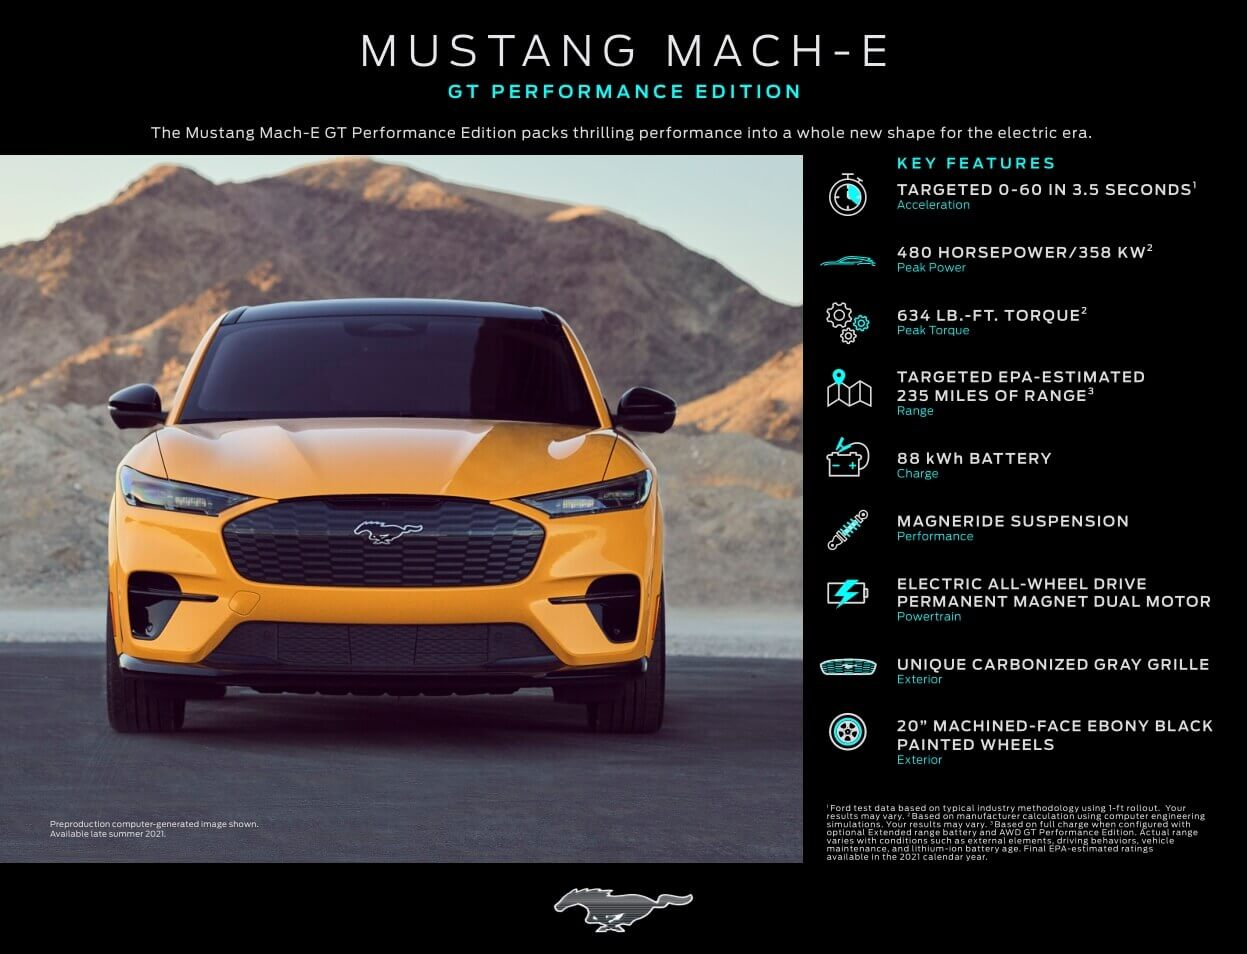 Основные характеристики Ford Mustang Mach-E GTPerformance Edition